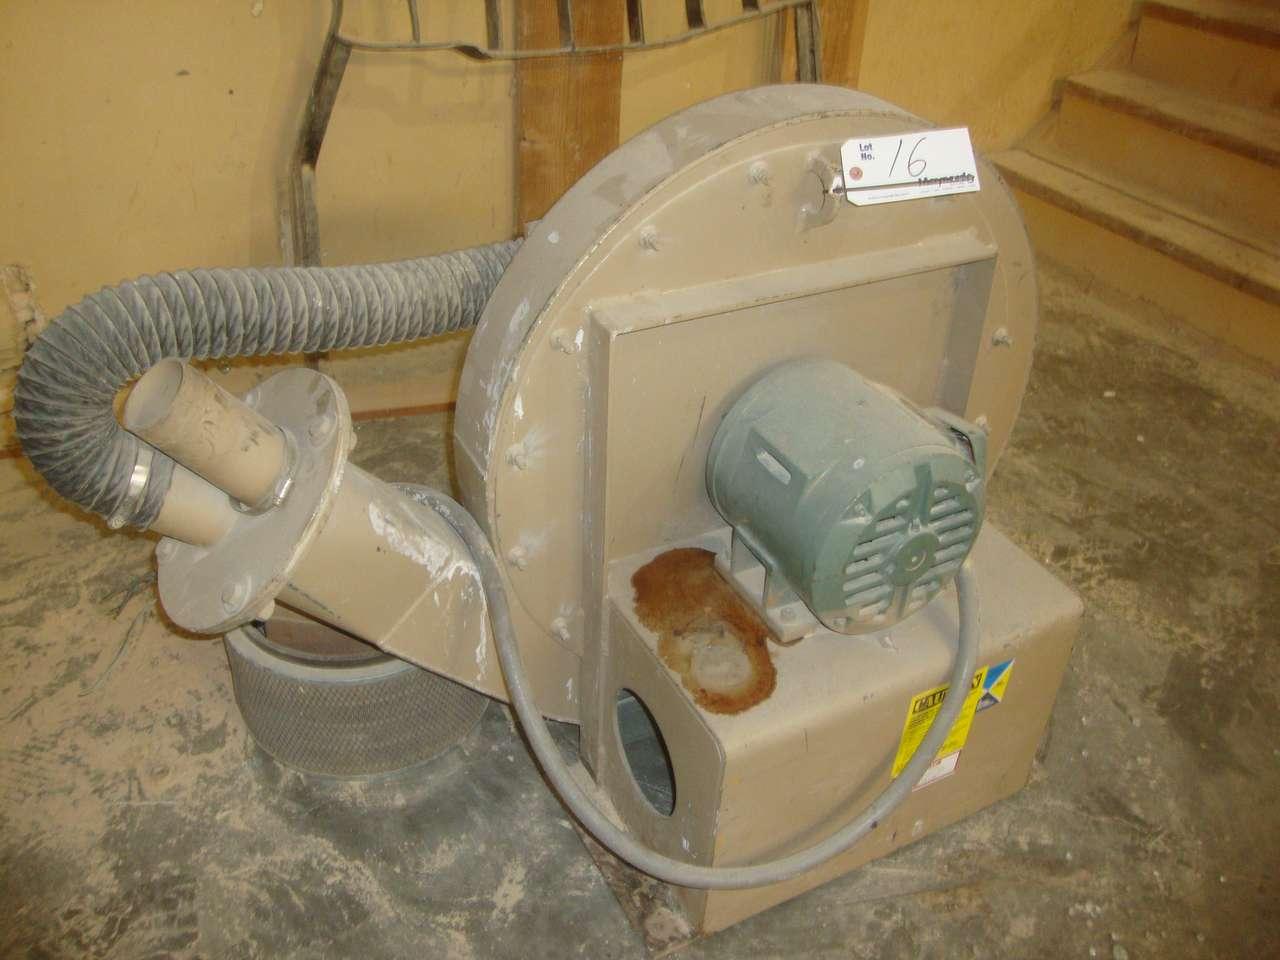 Lot 16 - NYB Pressure blower